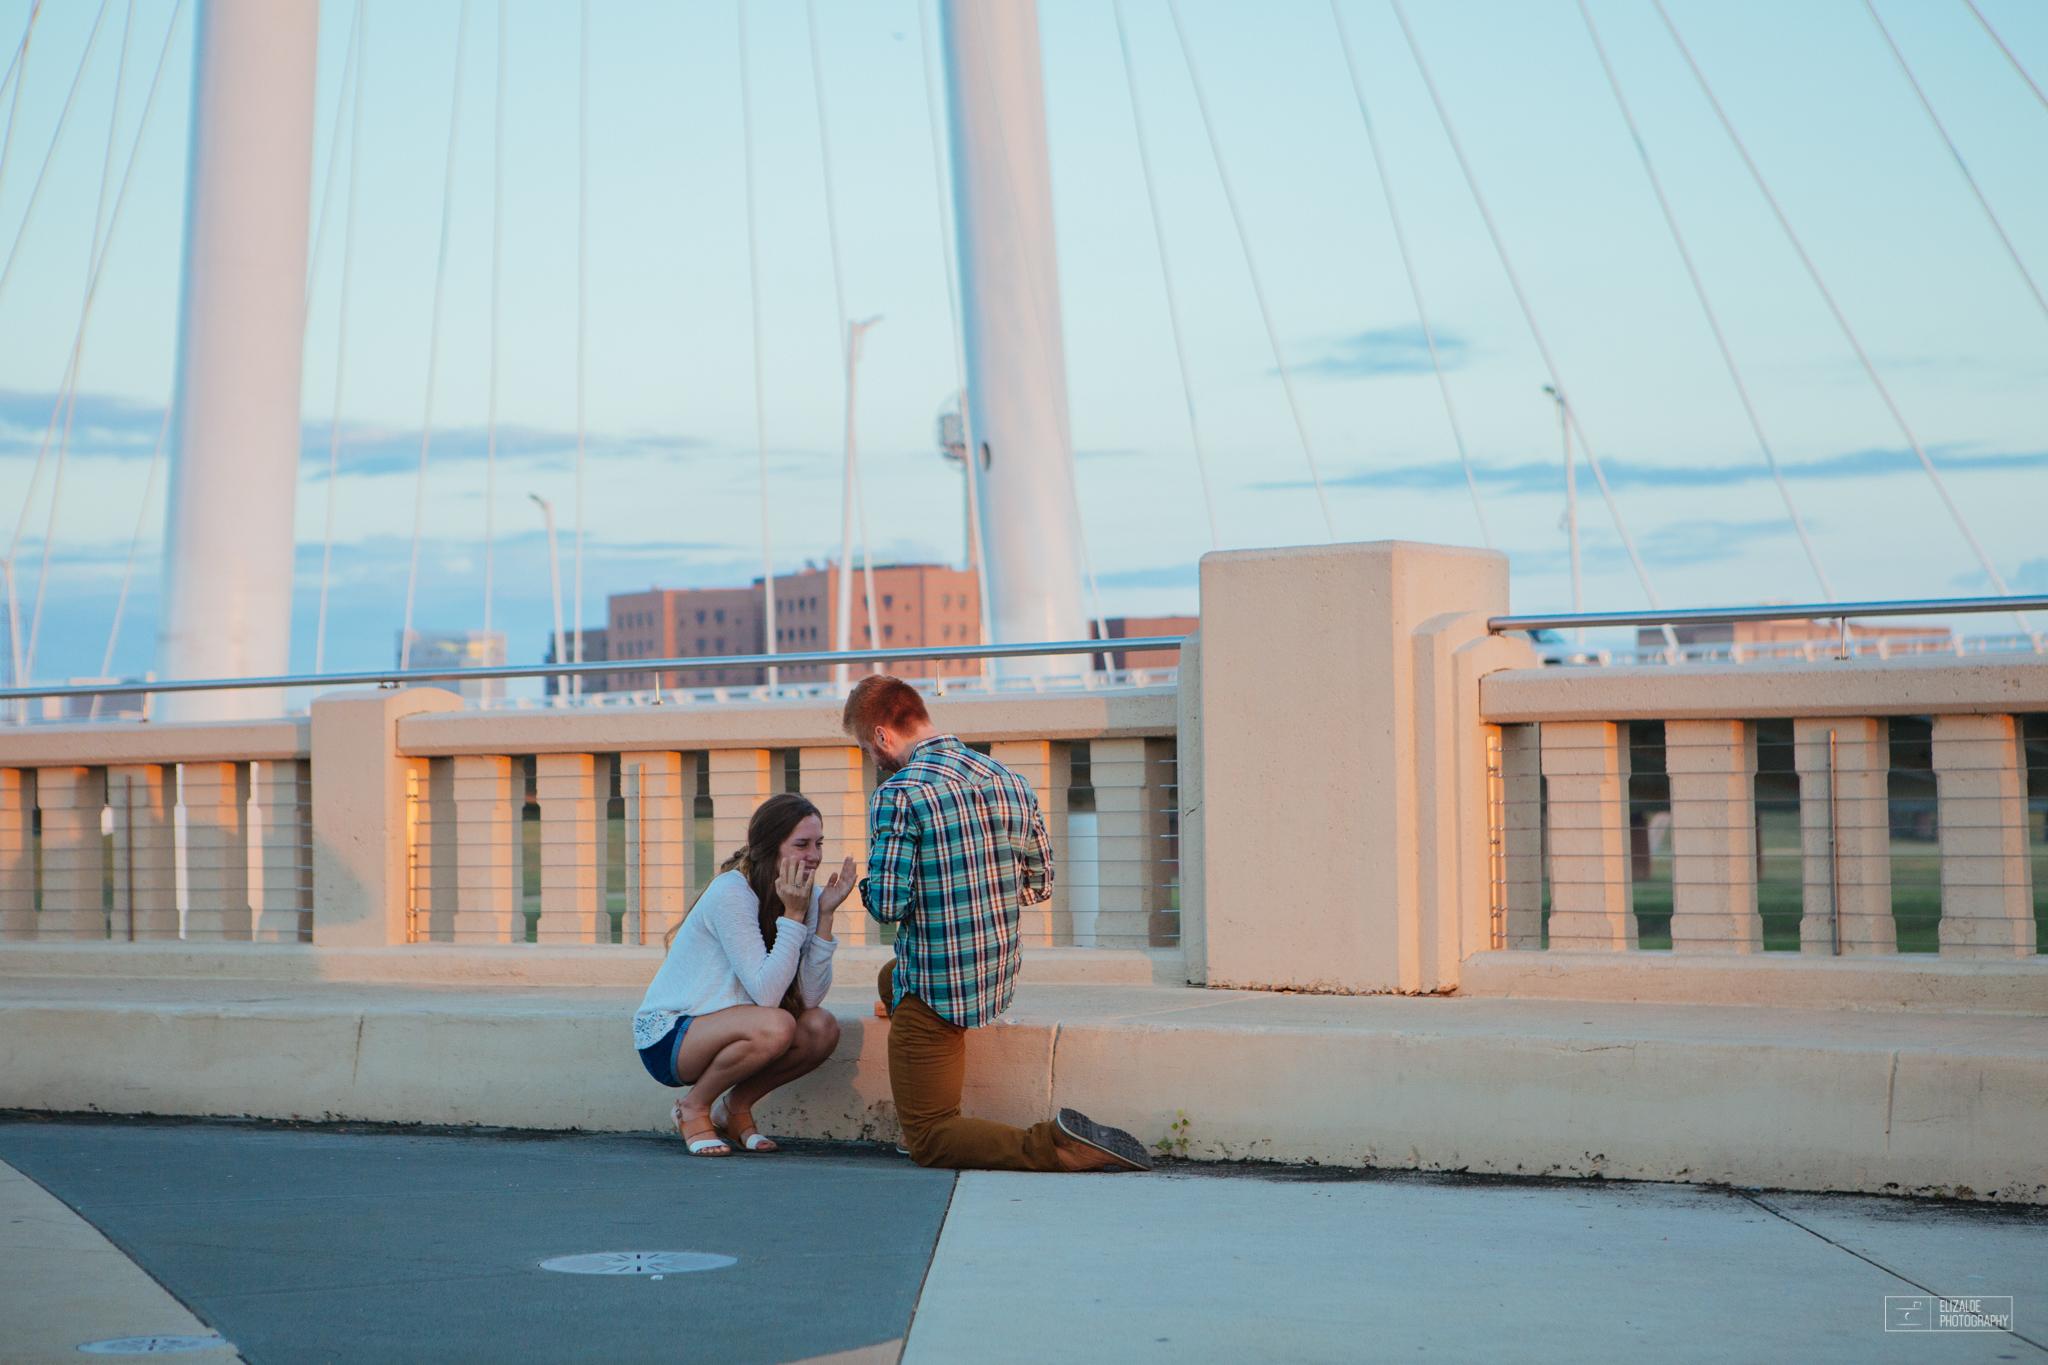 Proposal_DFW Wedding Photographer_Dallas Photographer_Elizalde Photography_margaret hunt hill bridge (4 of 21).jpg